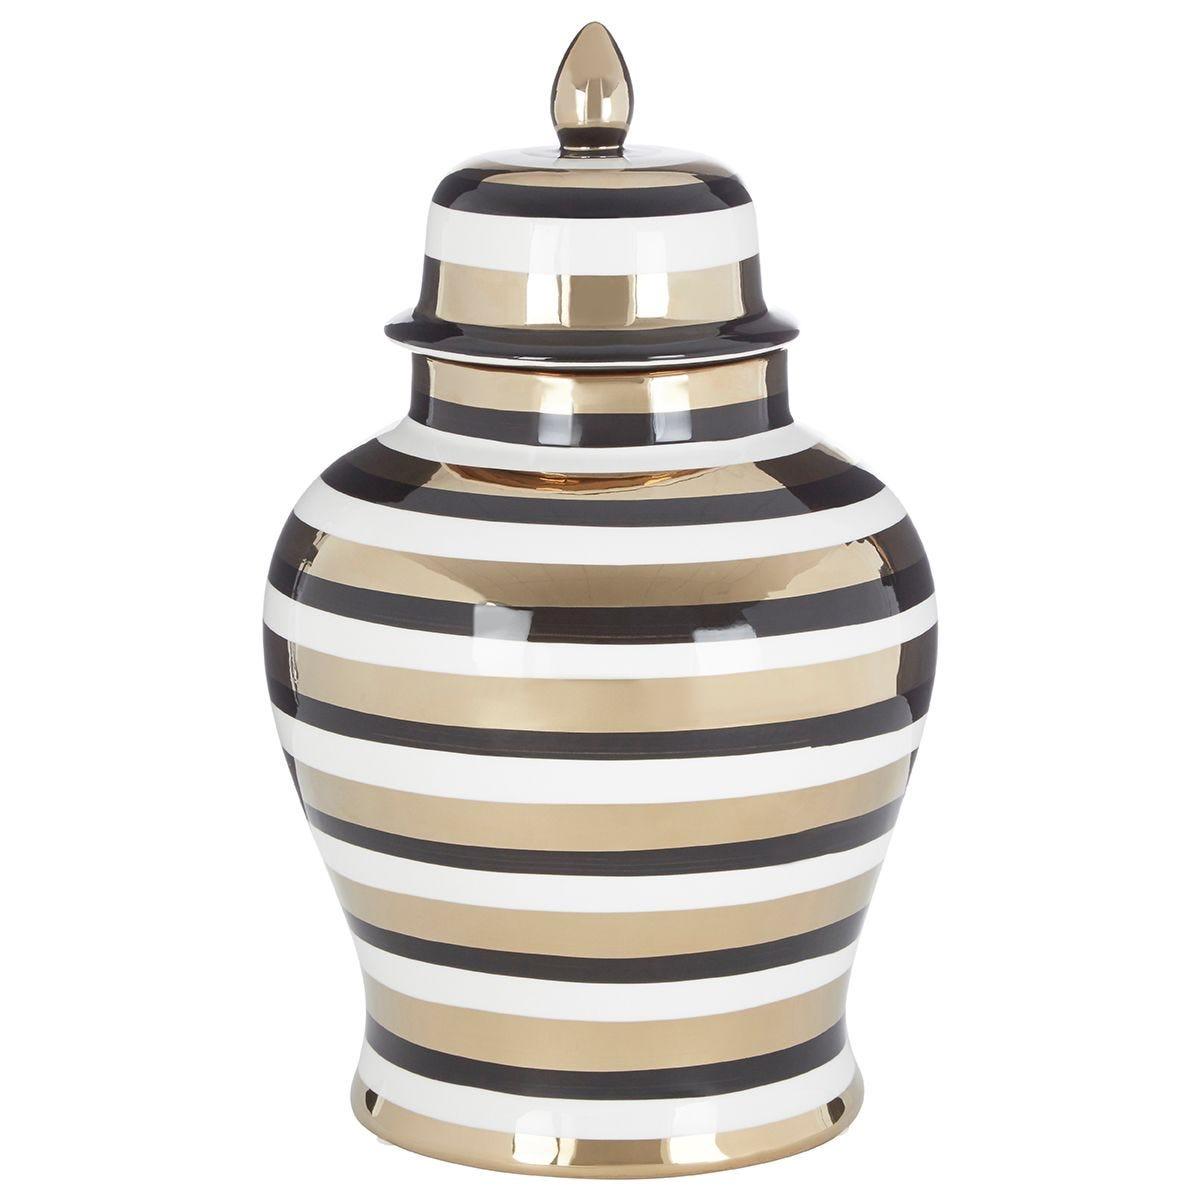 Premier Housewares Zeina Large Ceramic Jar - White/Black/Gold Finish